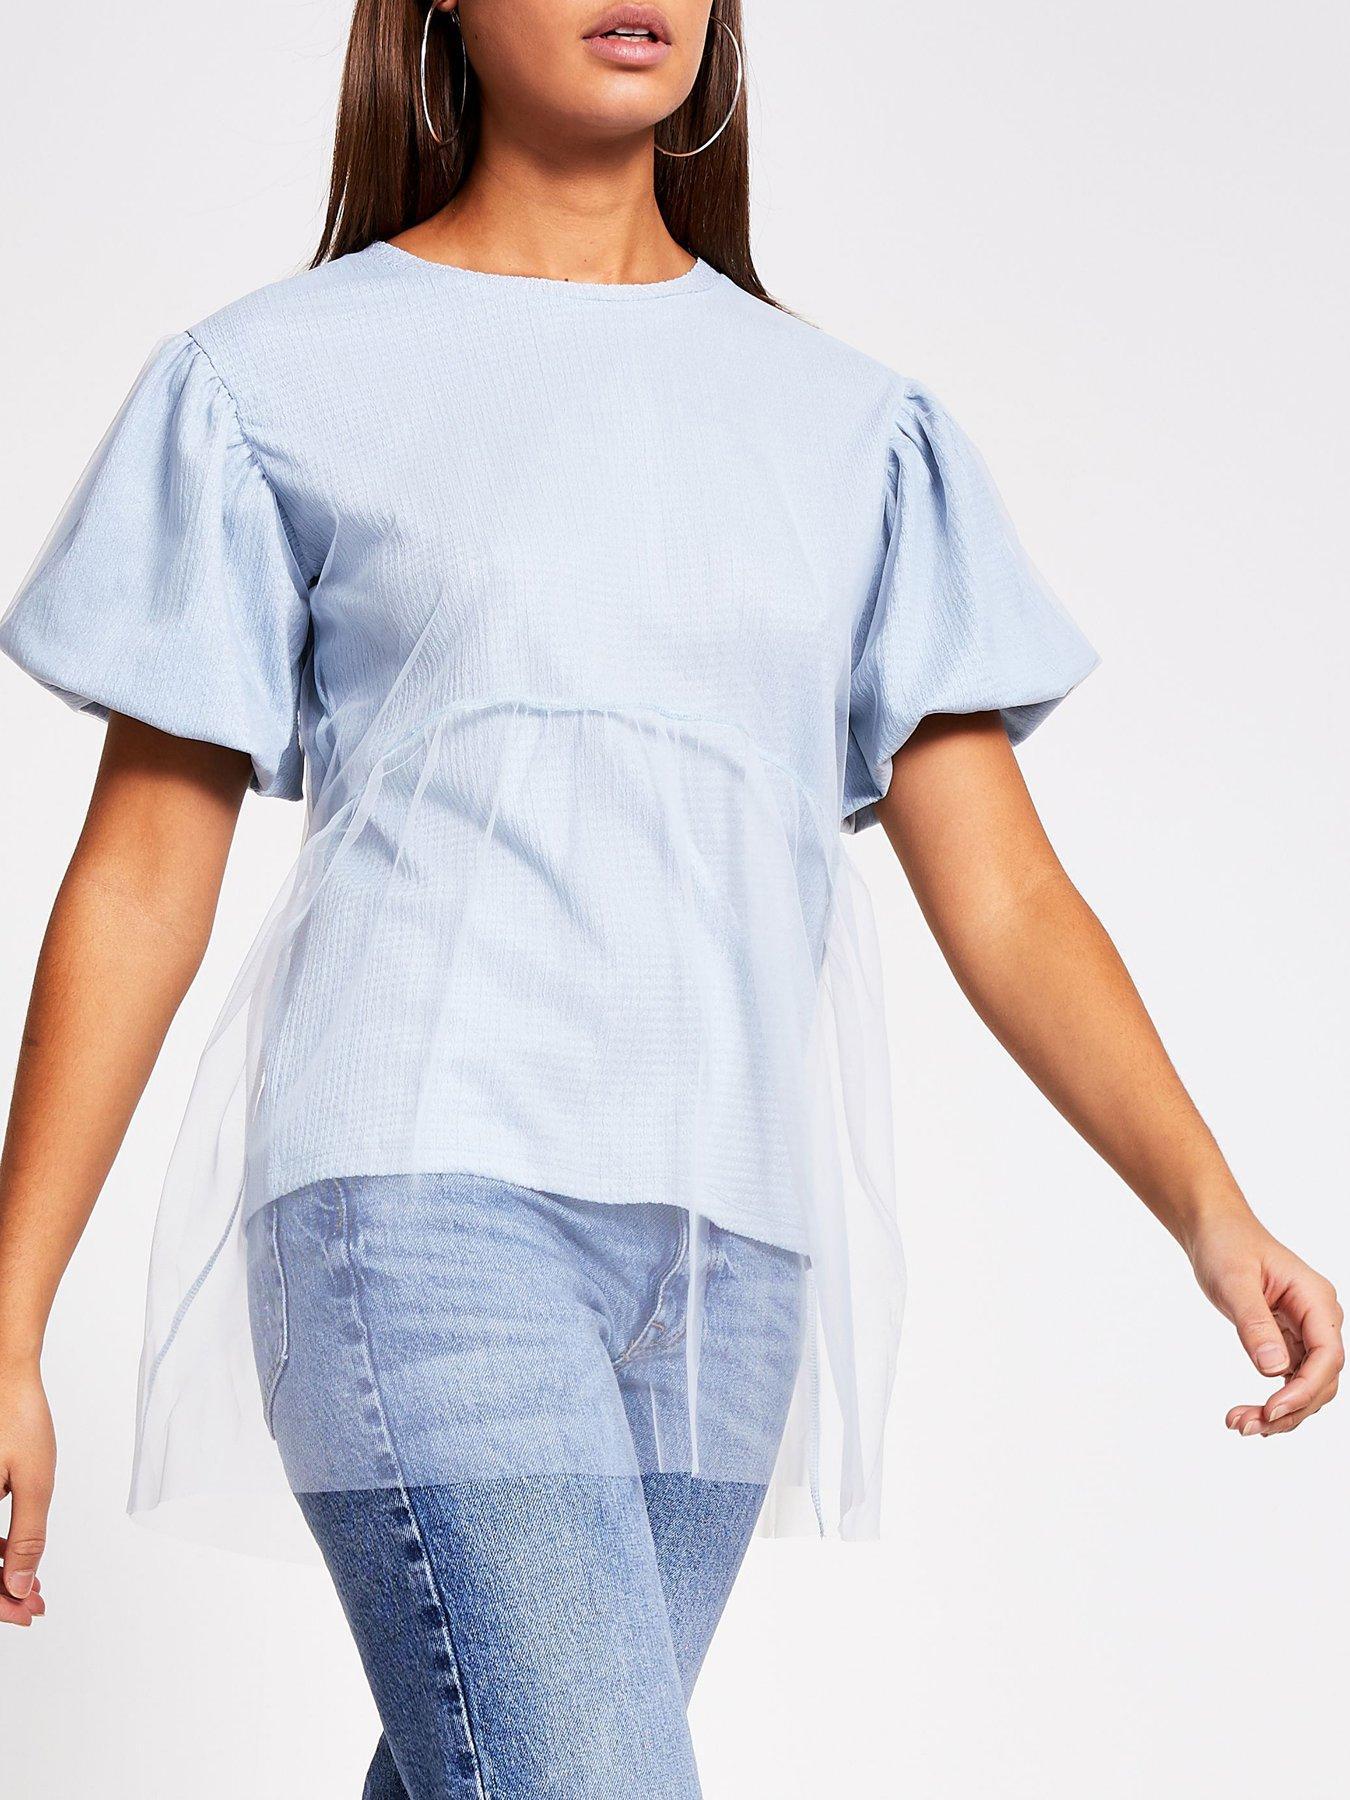 river island mesh t shirt